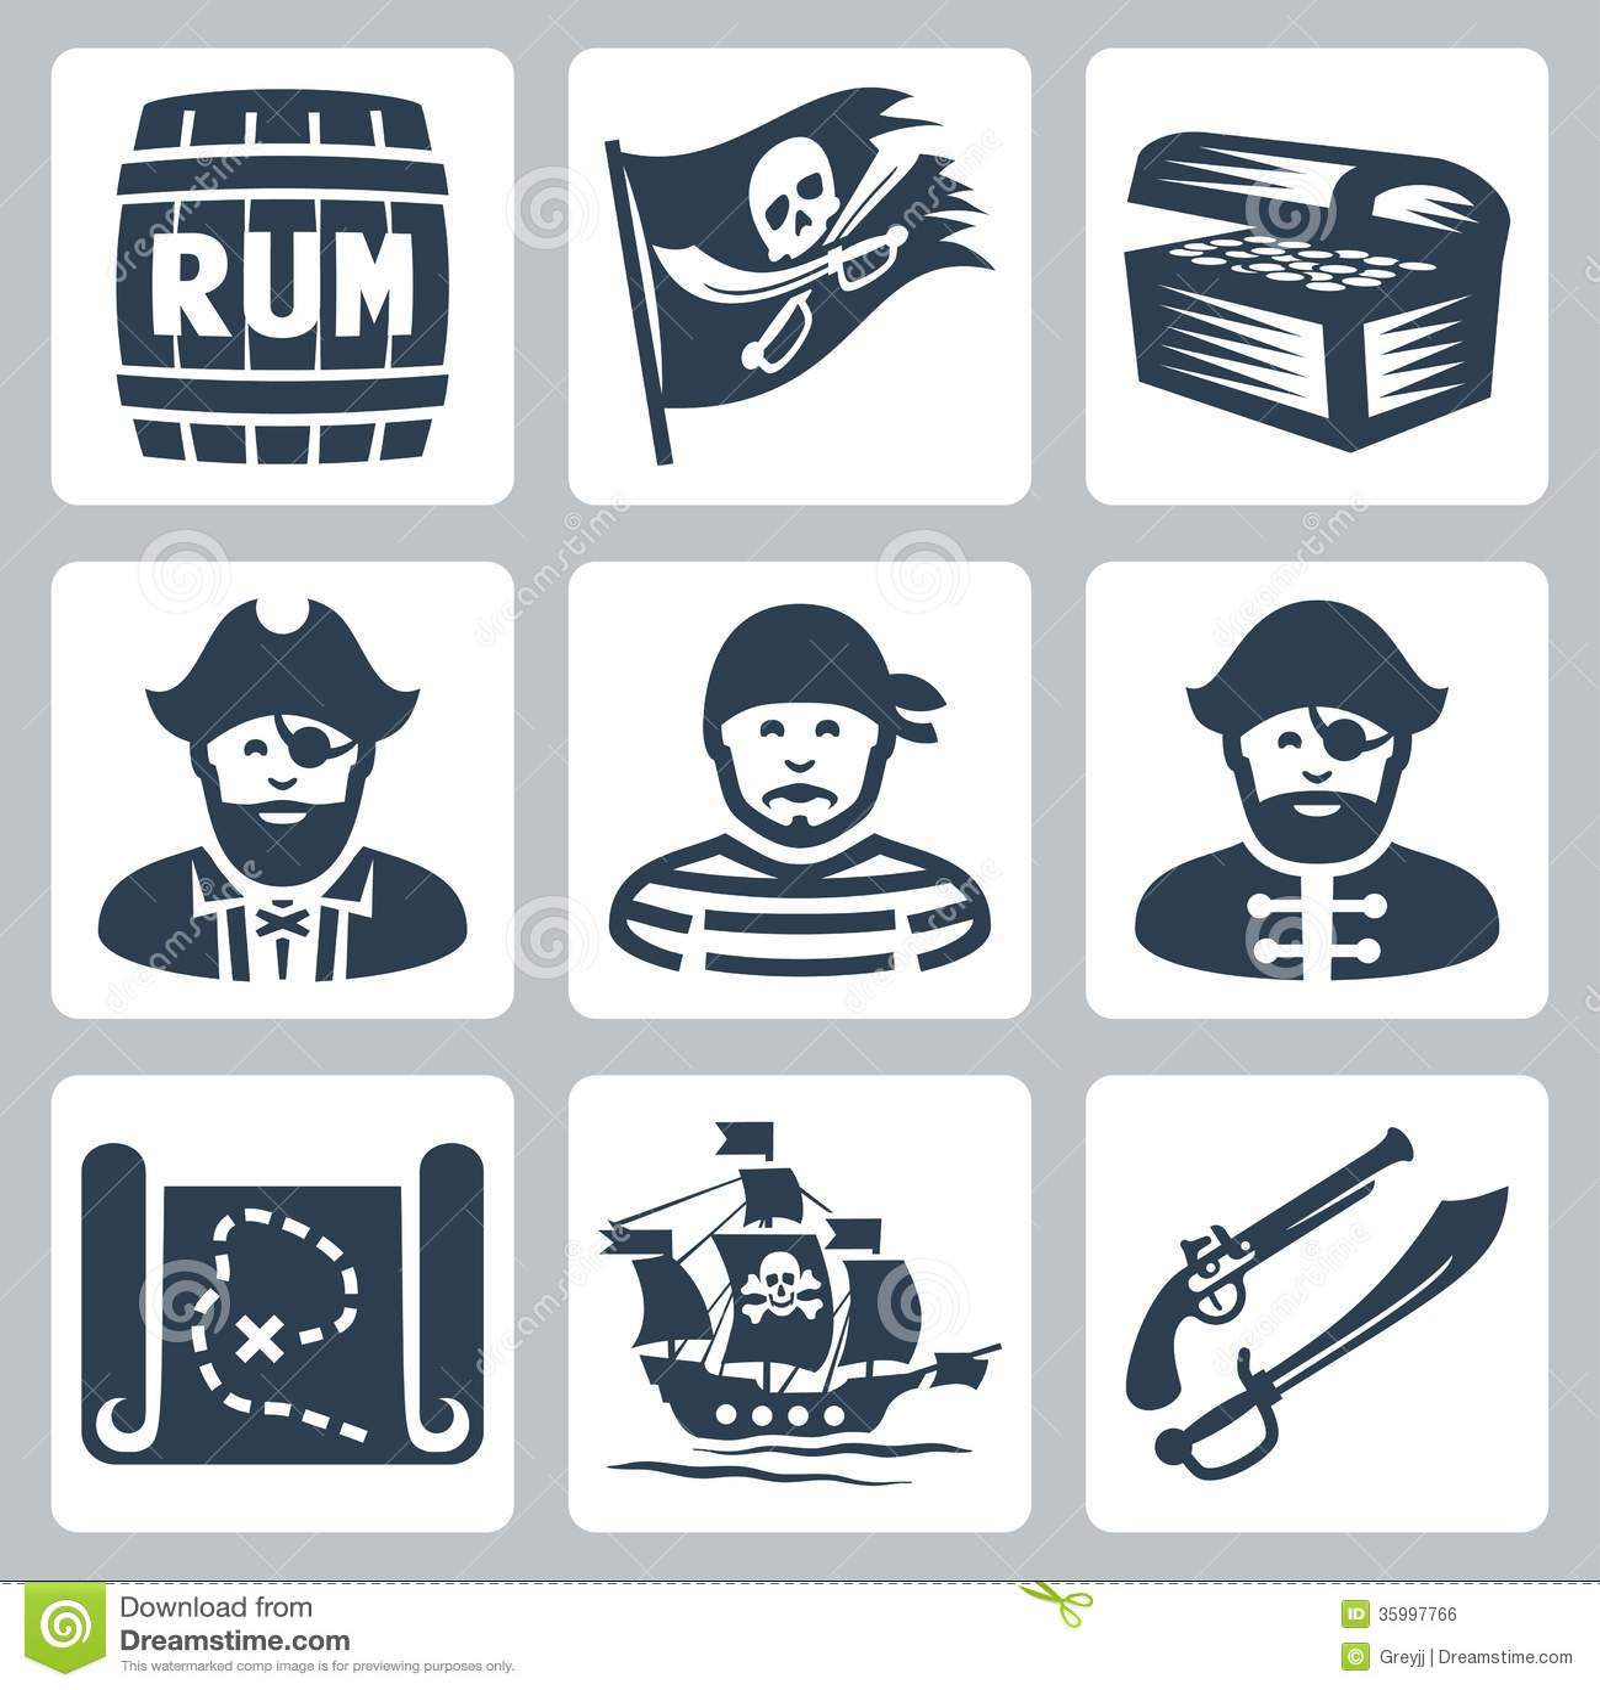 Royalty Free Stock Image Vector Pirates Piracy Icons Set Image35997766